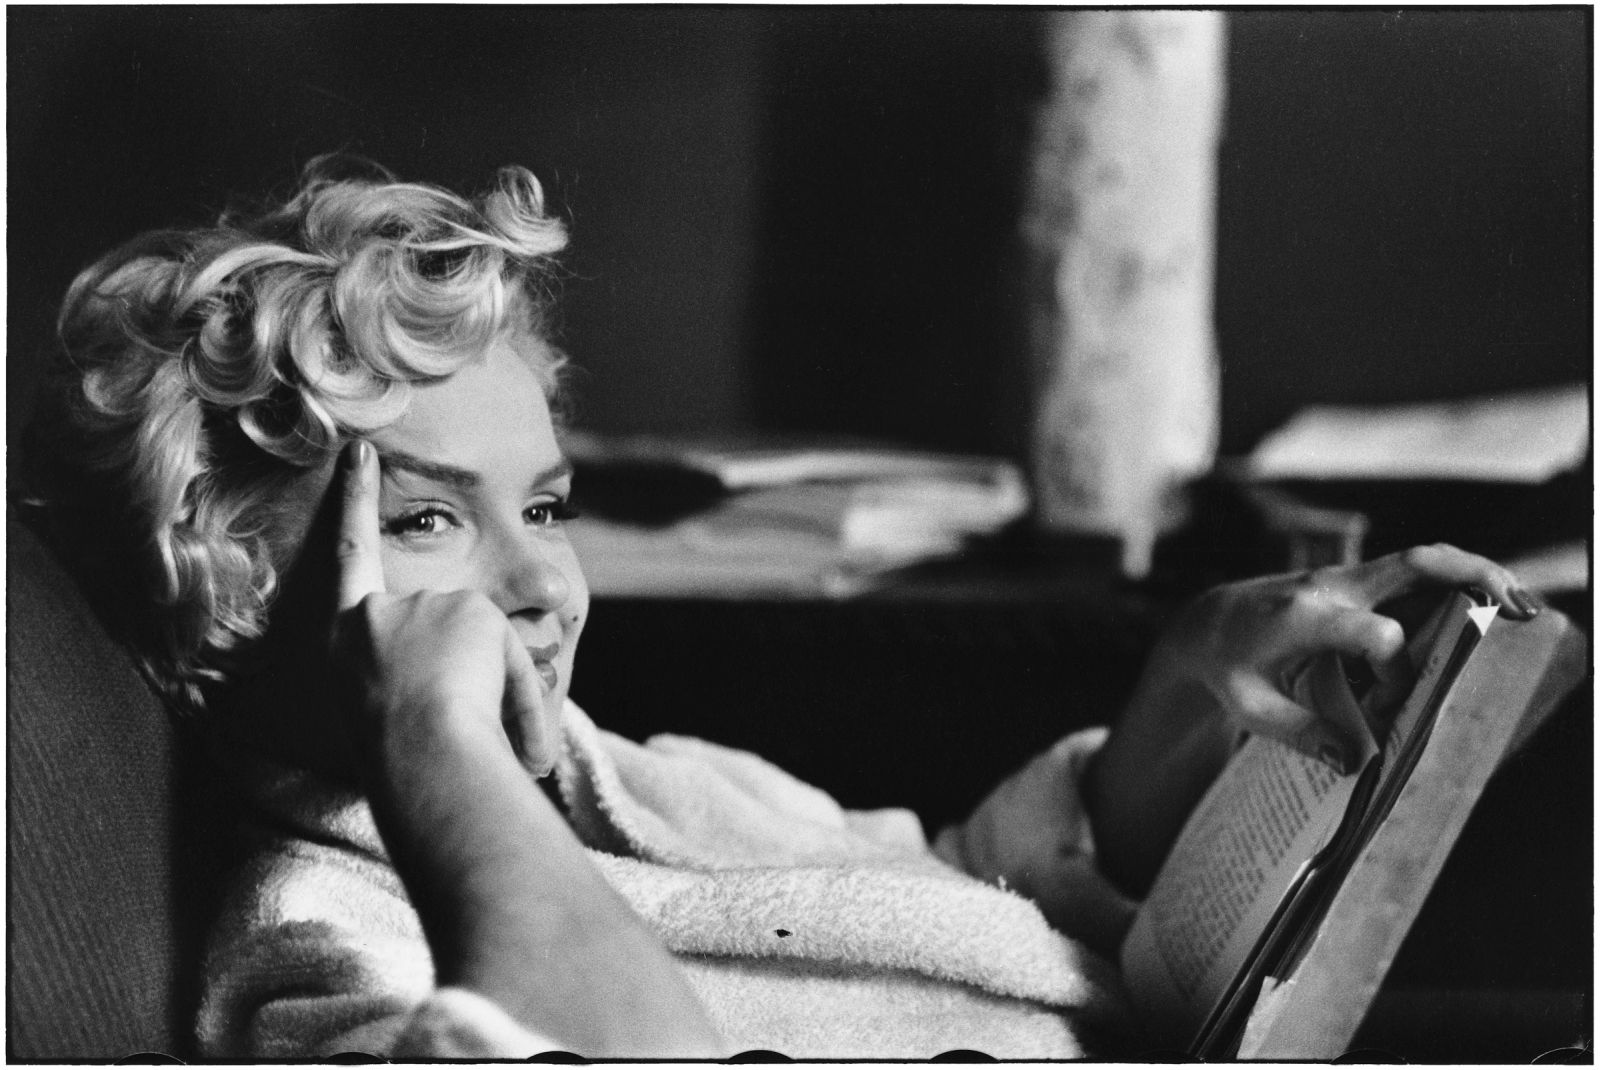 Elliott Erwitt, New York, 1956, American actress Marilyn Monroe © Elliott Erwitt/MAGNUM PHOTOS